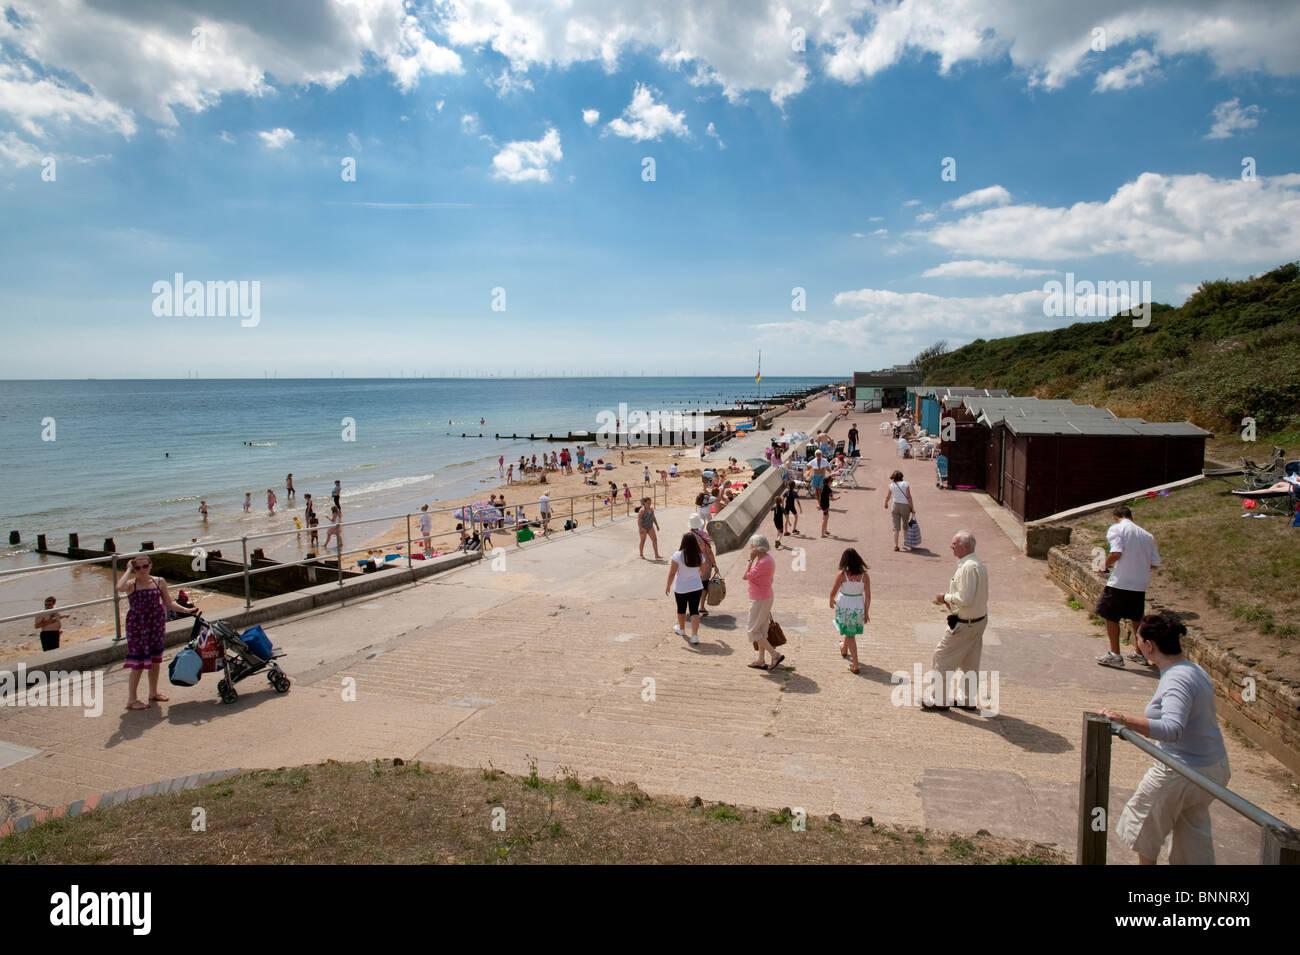 The Esplanade at Frinton-on-Sea, Essex - Stock Image